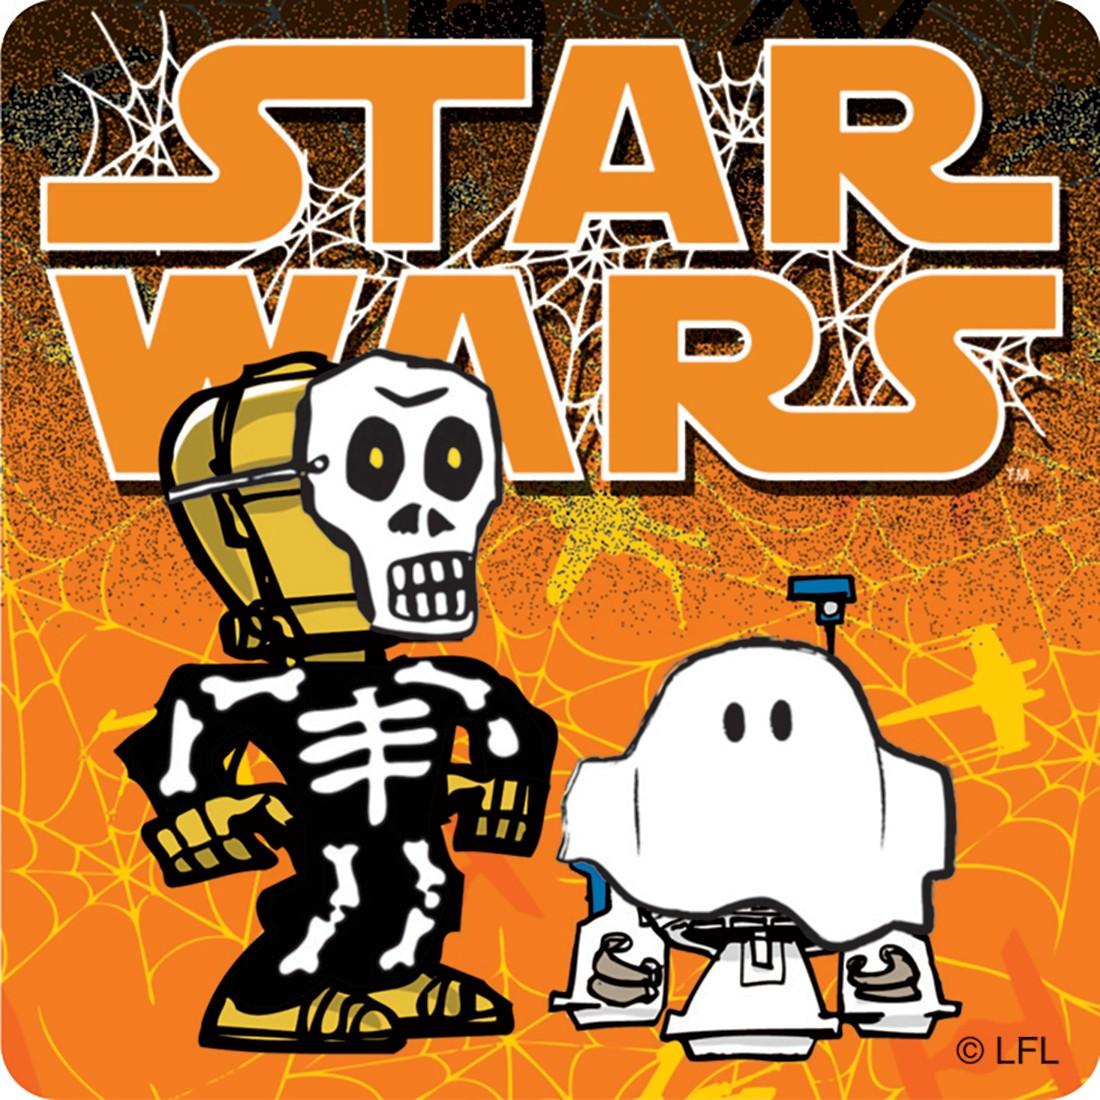 Star wars stickers from. Starwars clipart halloween